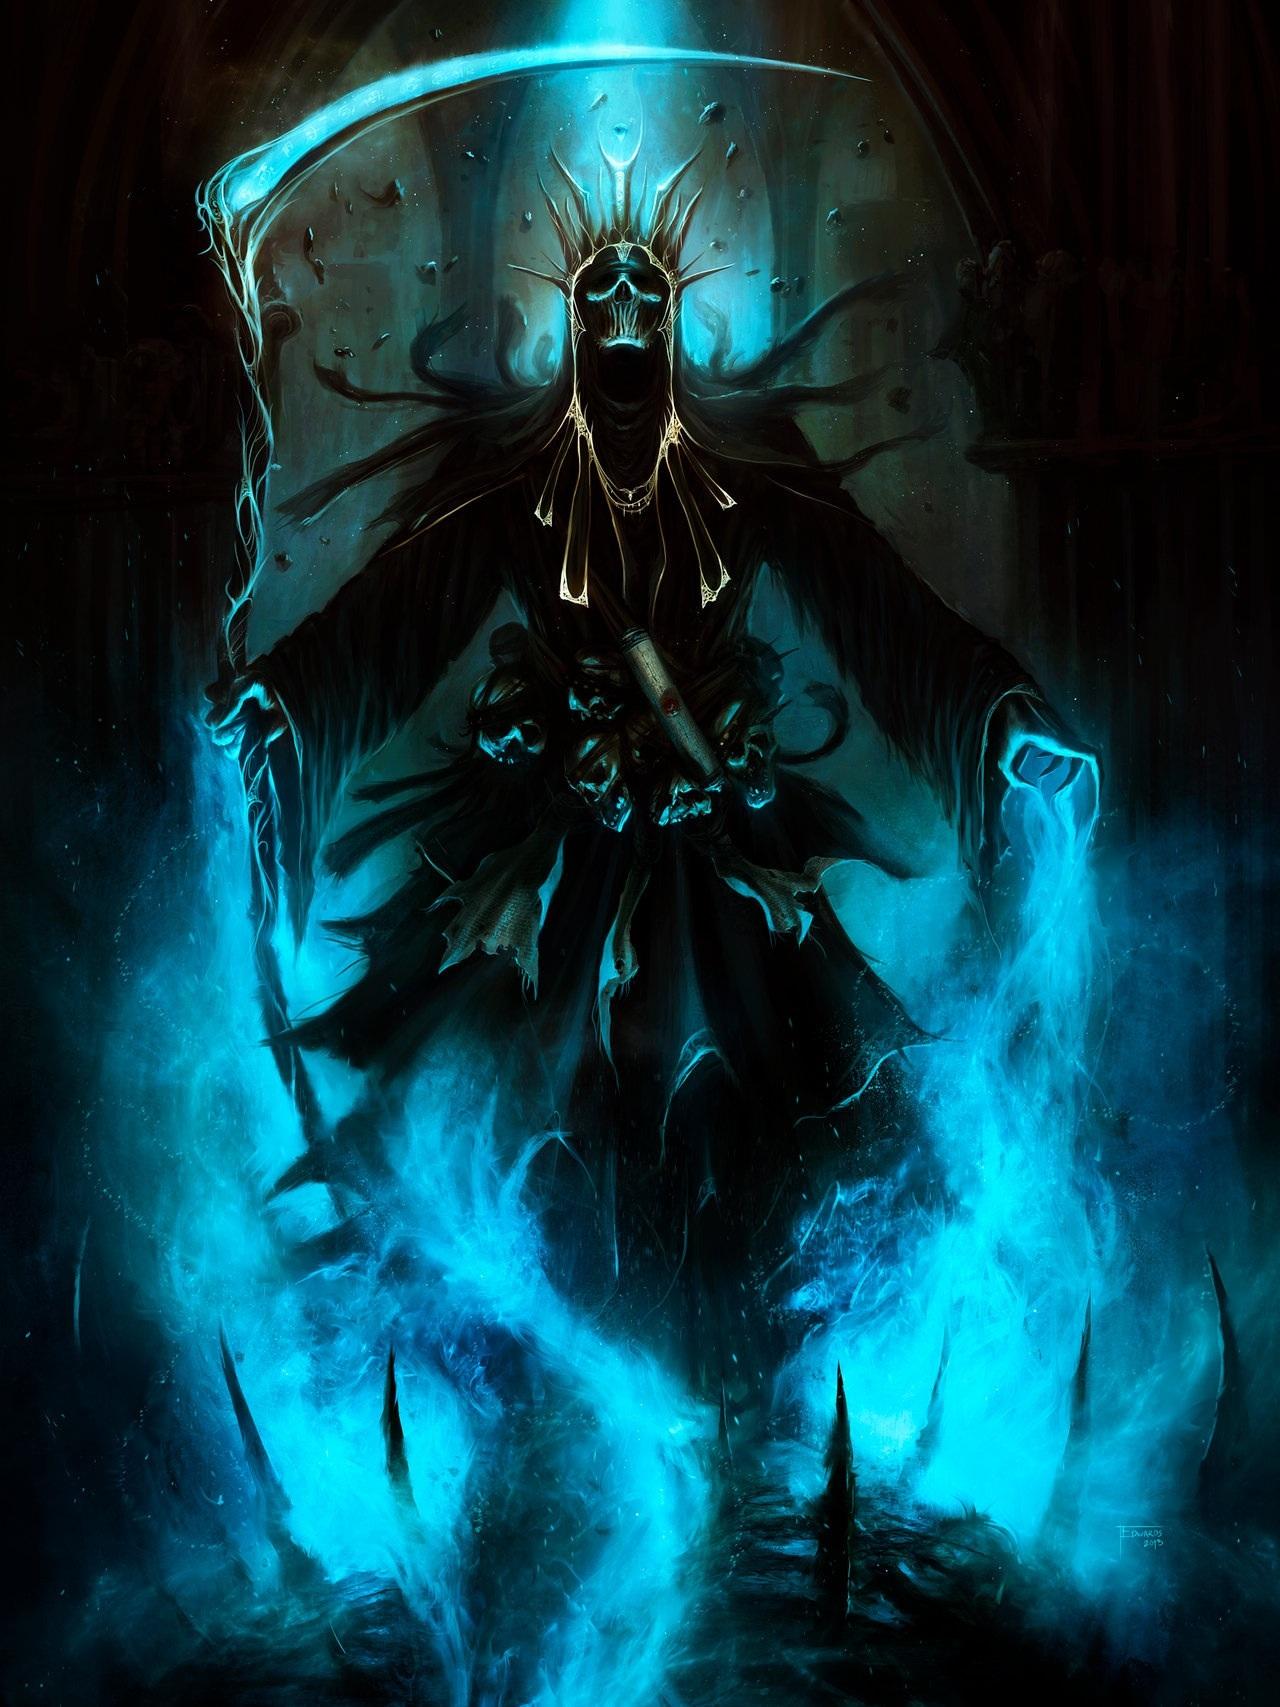 the grim reaper images Grim Wallpaper HD wallpaper and 1280x1707